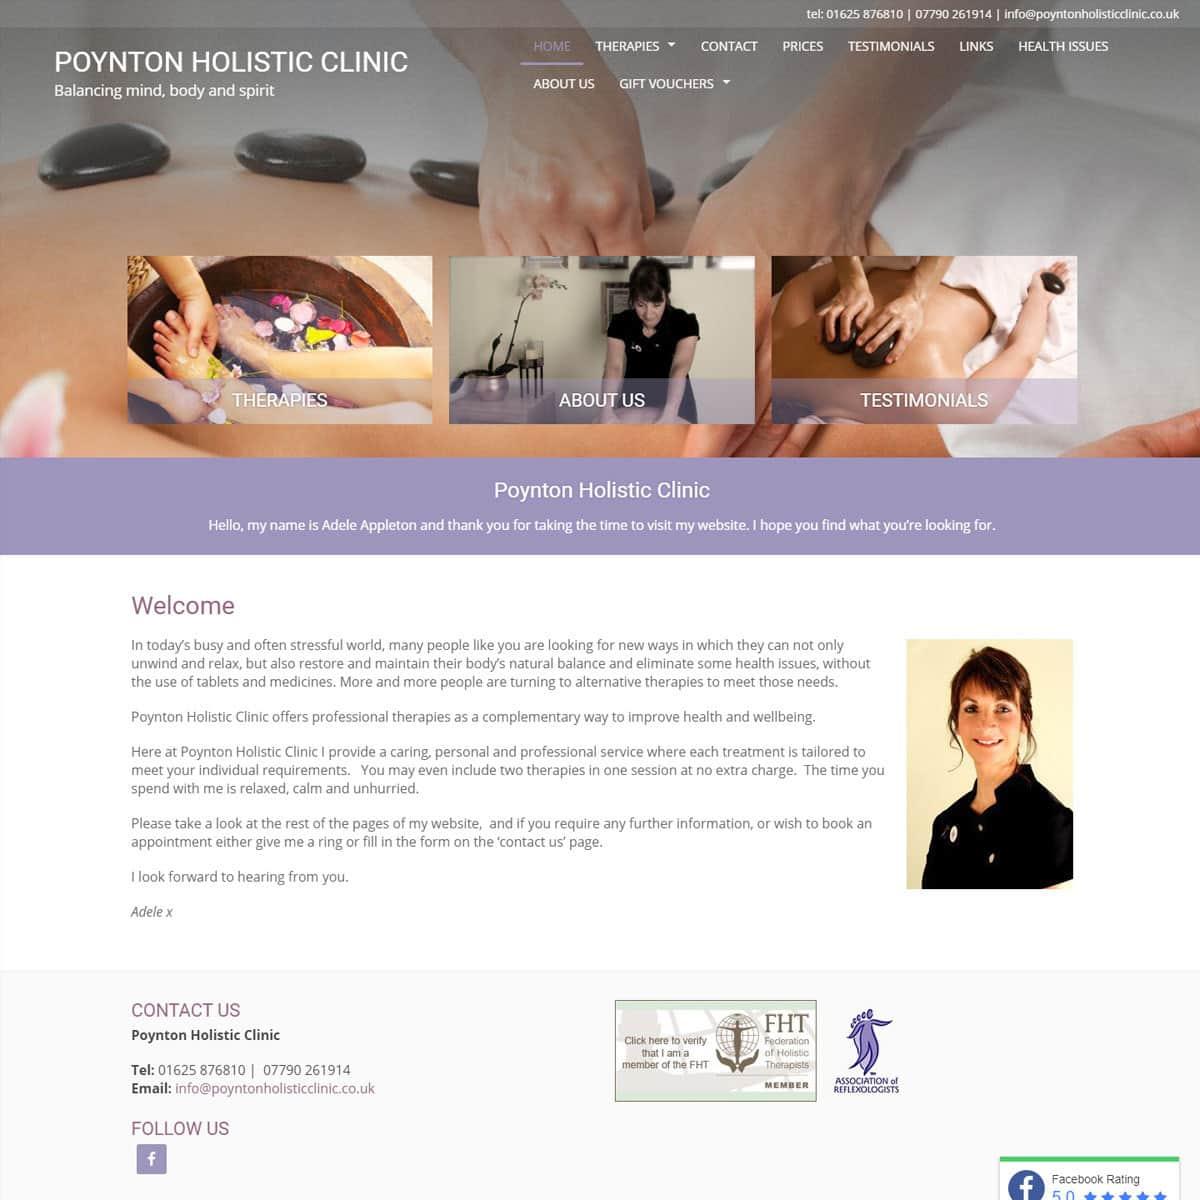 poyntonholisticclinic